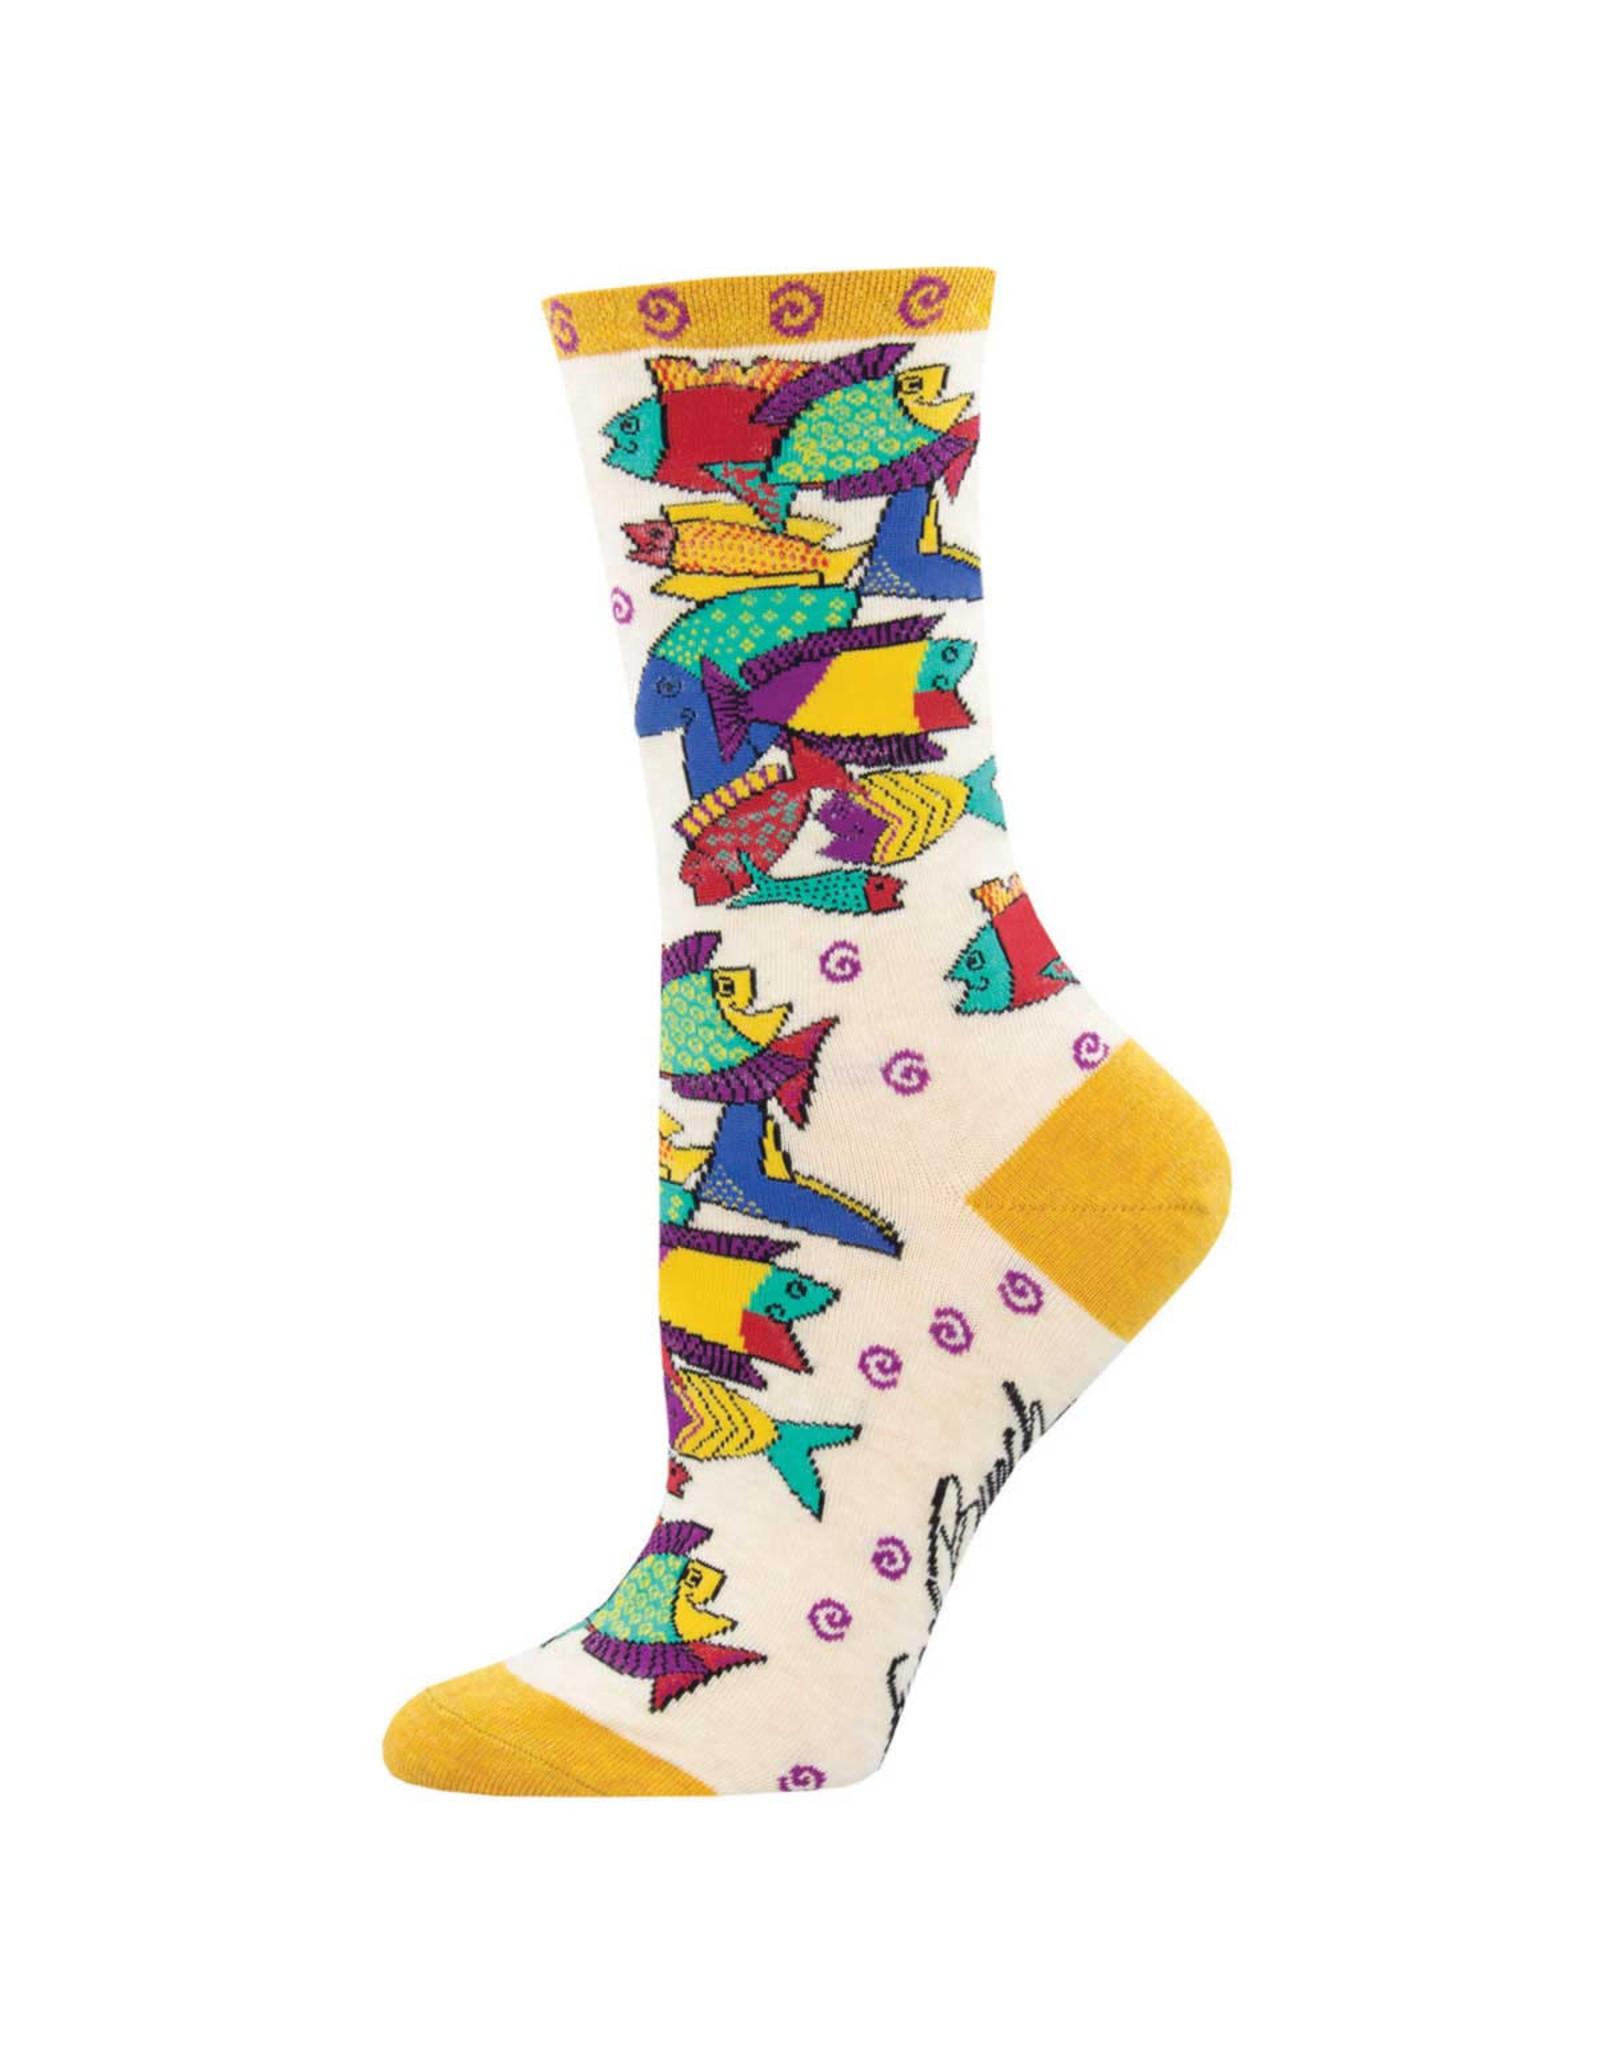 Socksmith Design Pescadero Ivory Heather 9-11 Women's Crew Socks